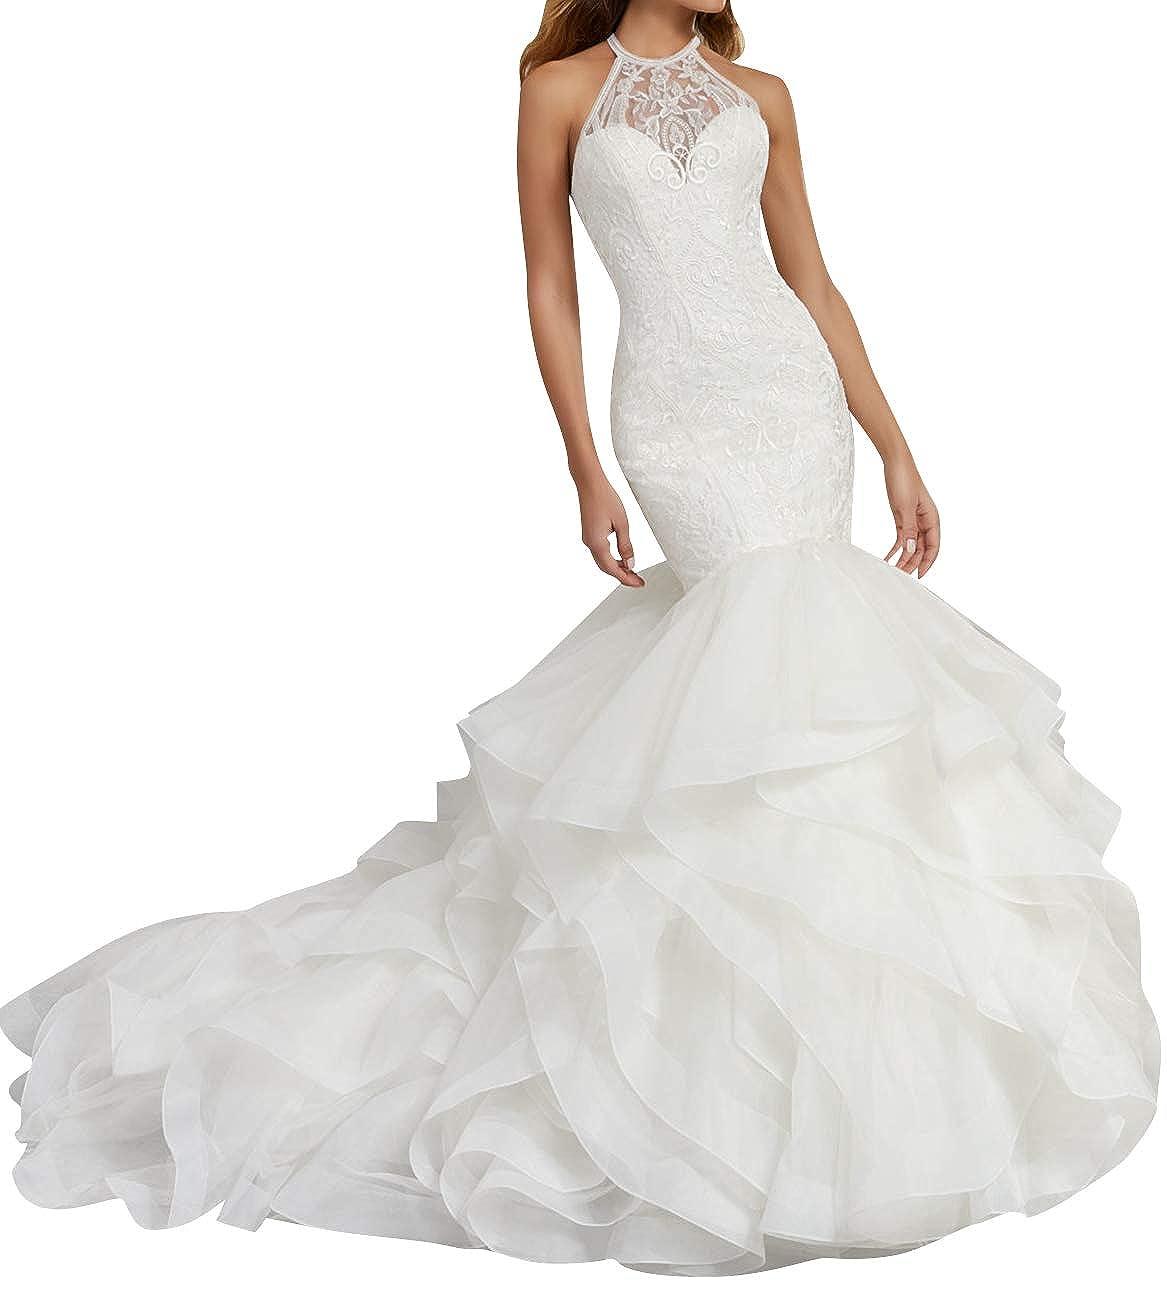 JAEDEN Wedding Dress Lace Halter Bride Dresses Mermaid Wedding Gown Trumpet Ruffles CL000352